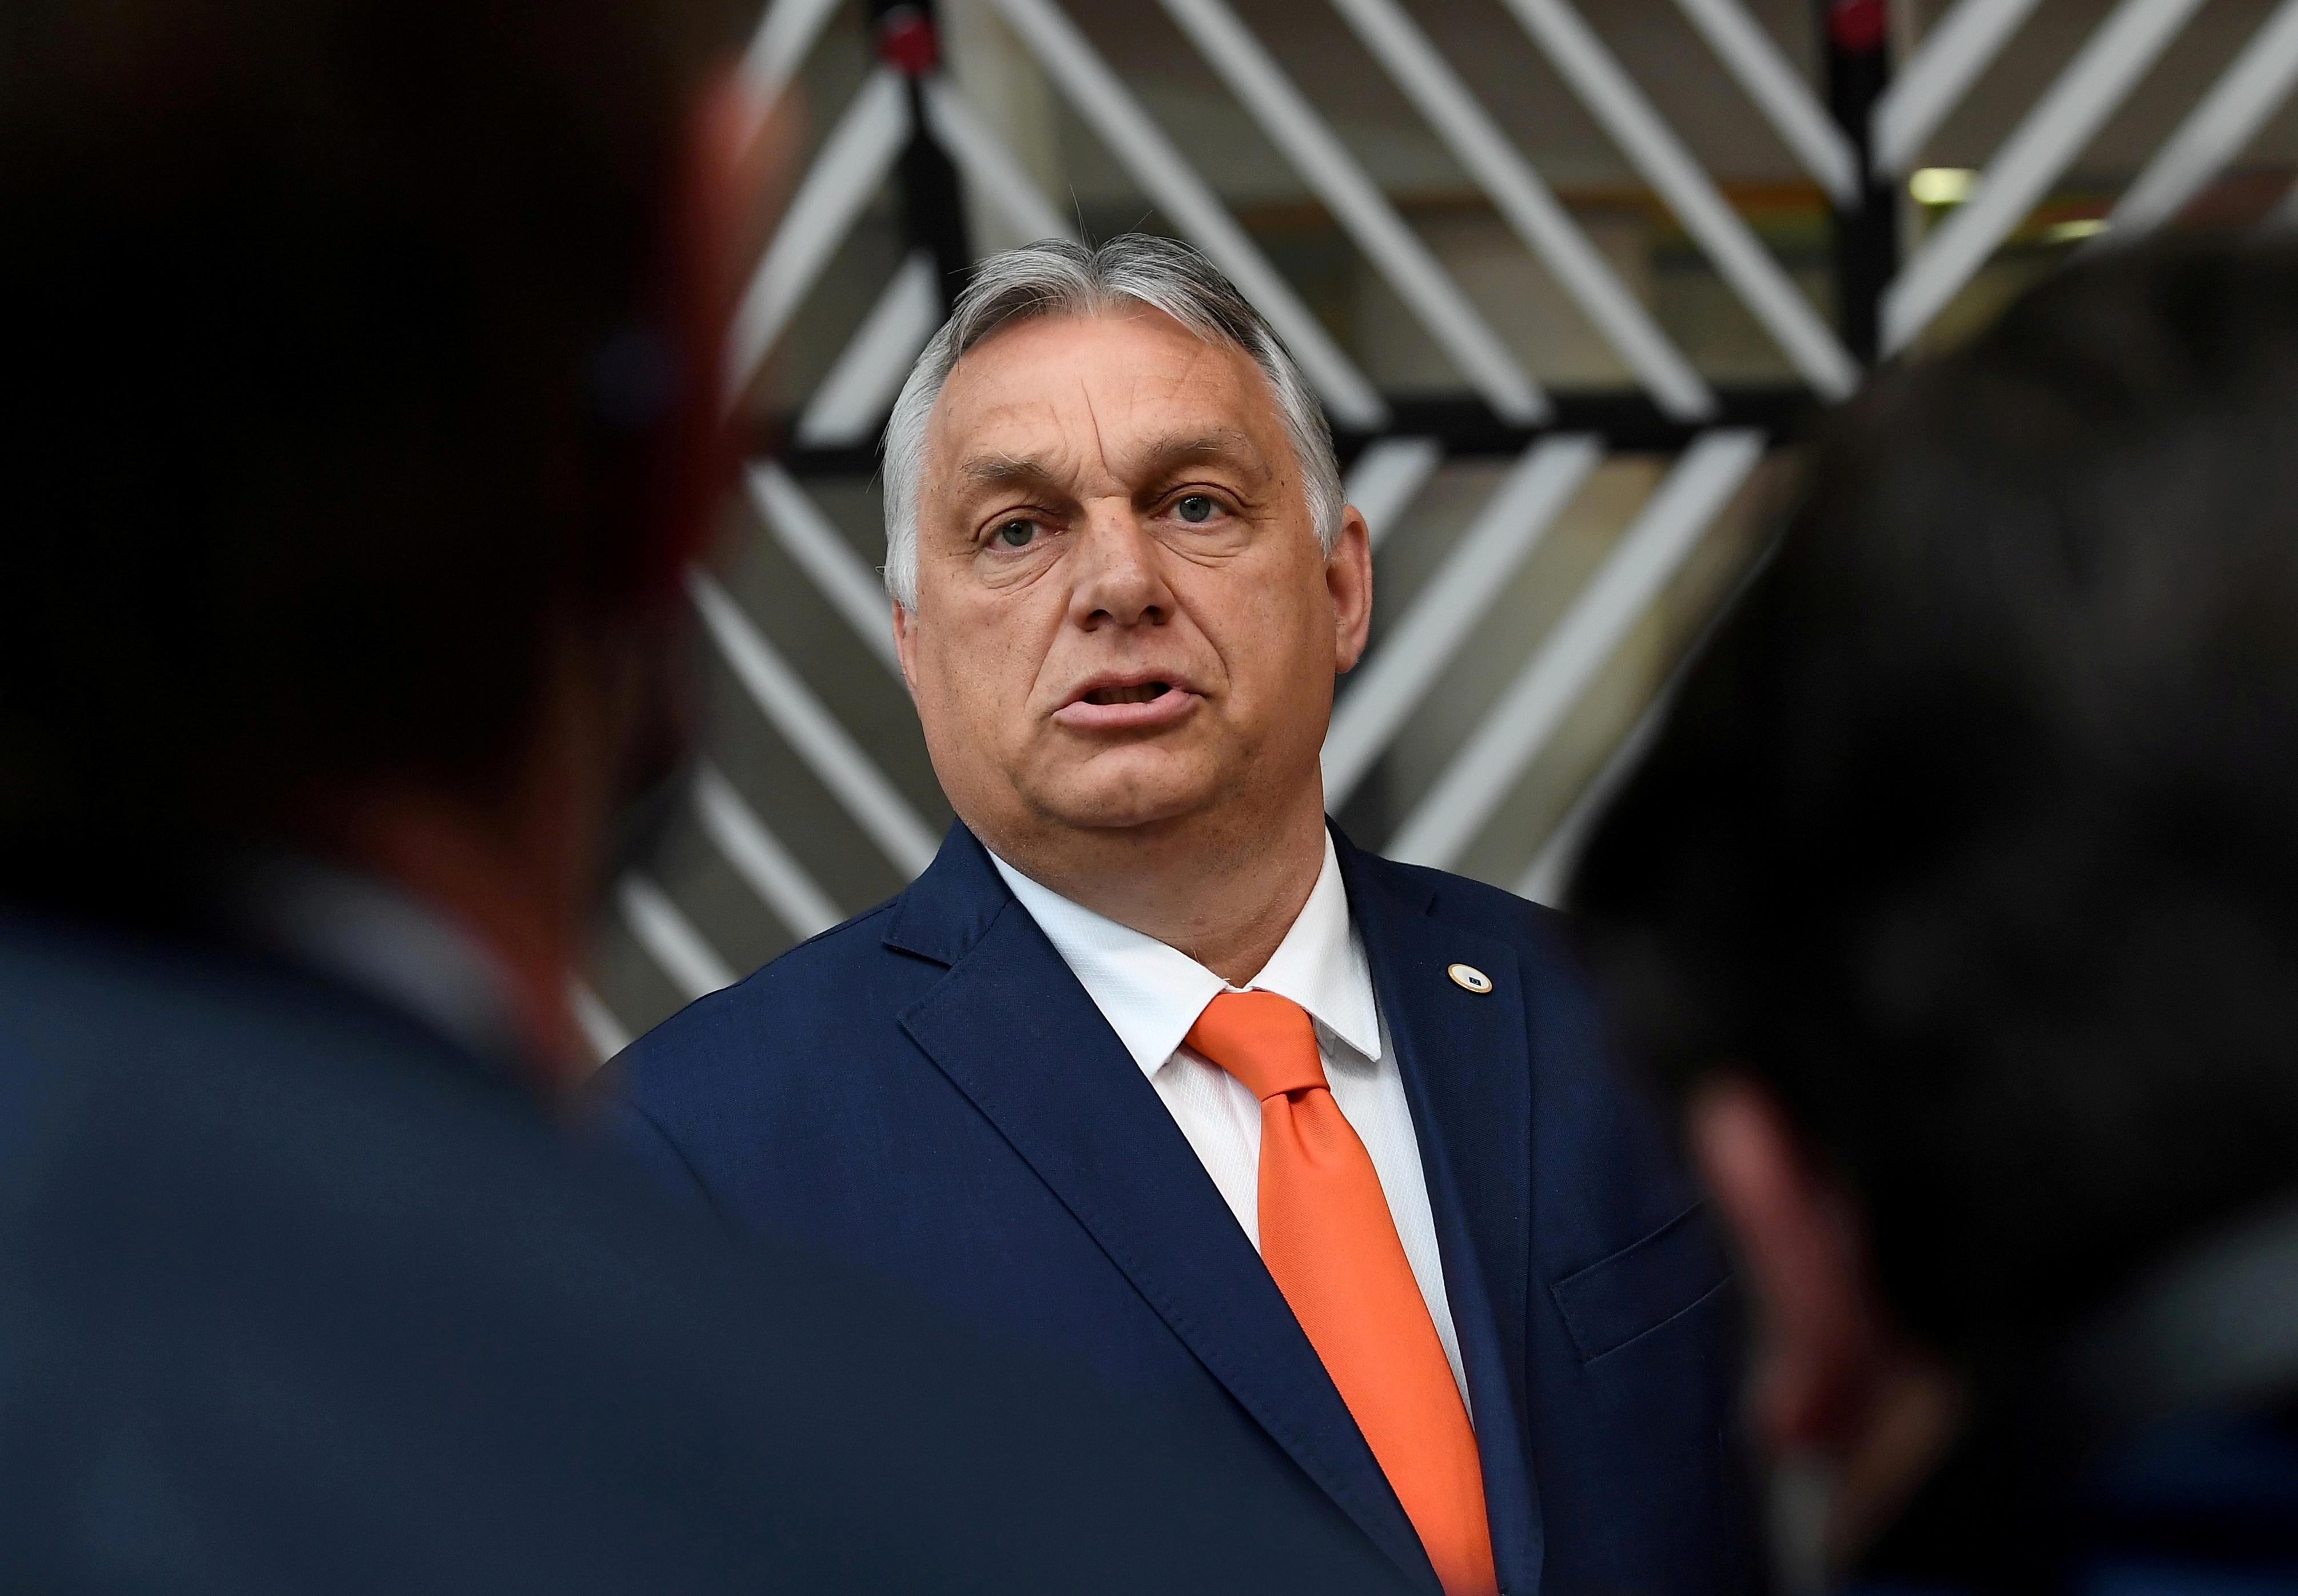 Hungary's Prime Minister Viktor Orban in Brussels, Belgium June 24, 2021. John Thys/Pool via REUTERS